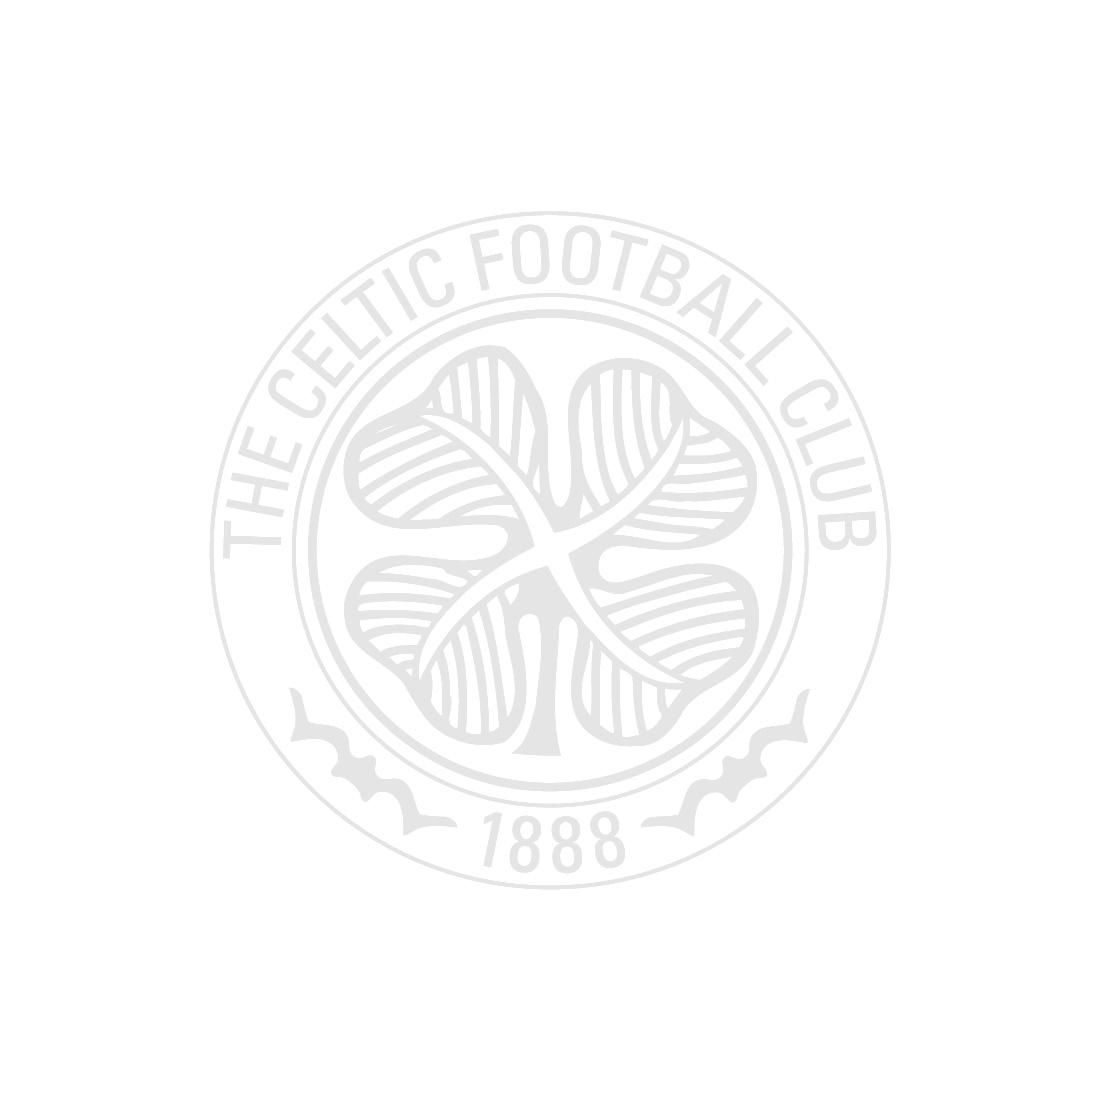 His Name Is McNamara Book